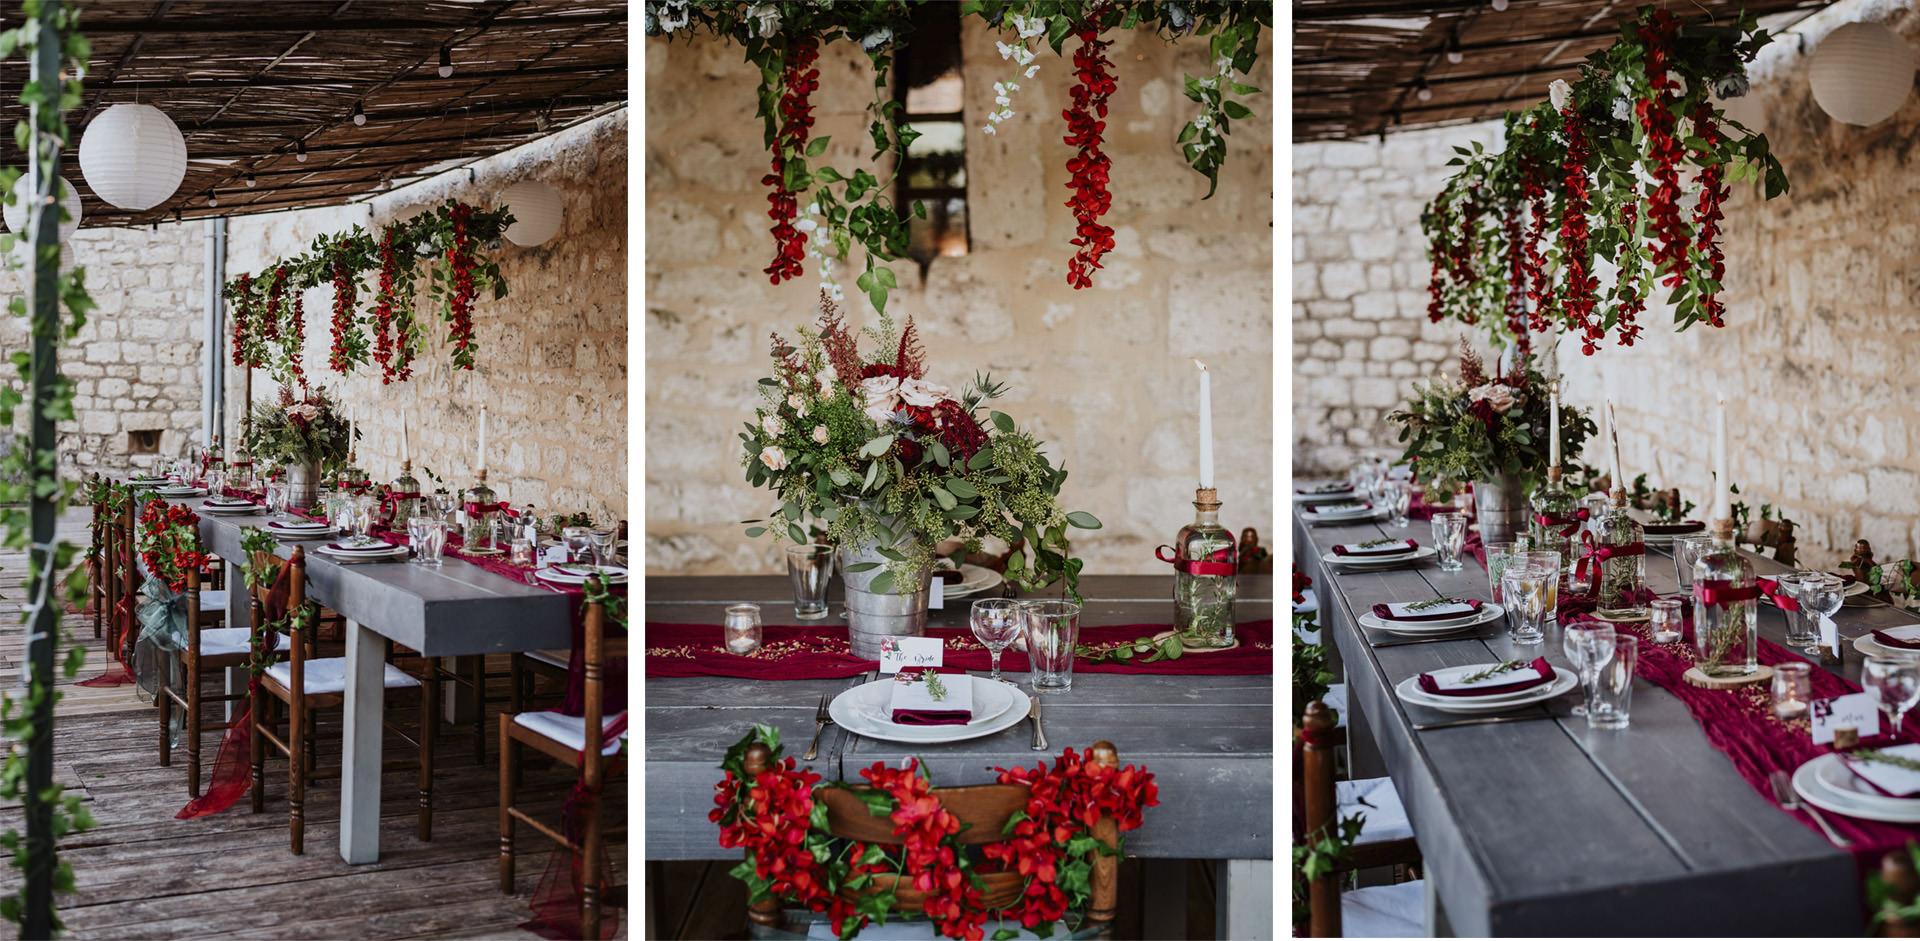 Chateau wedding venue france inspiration